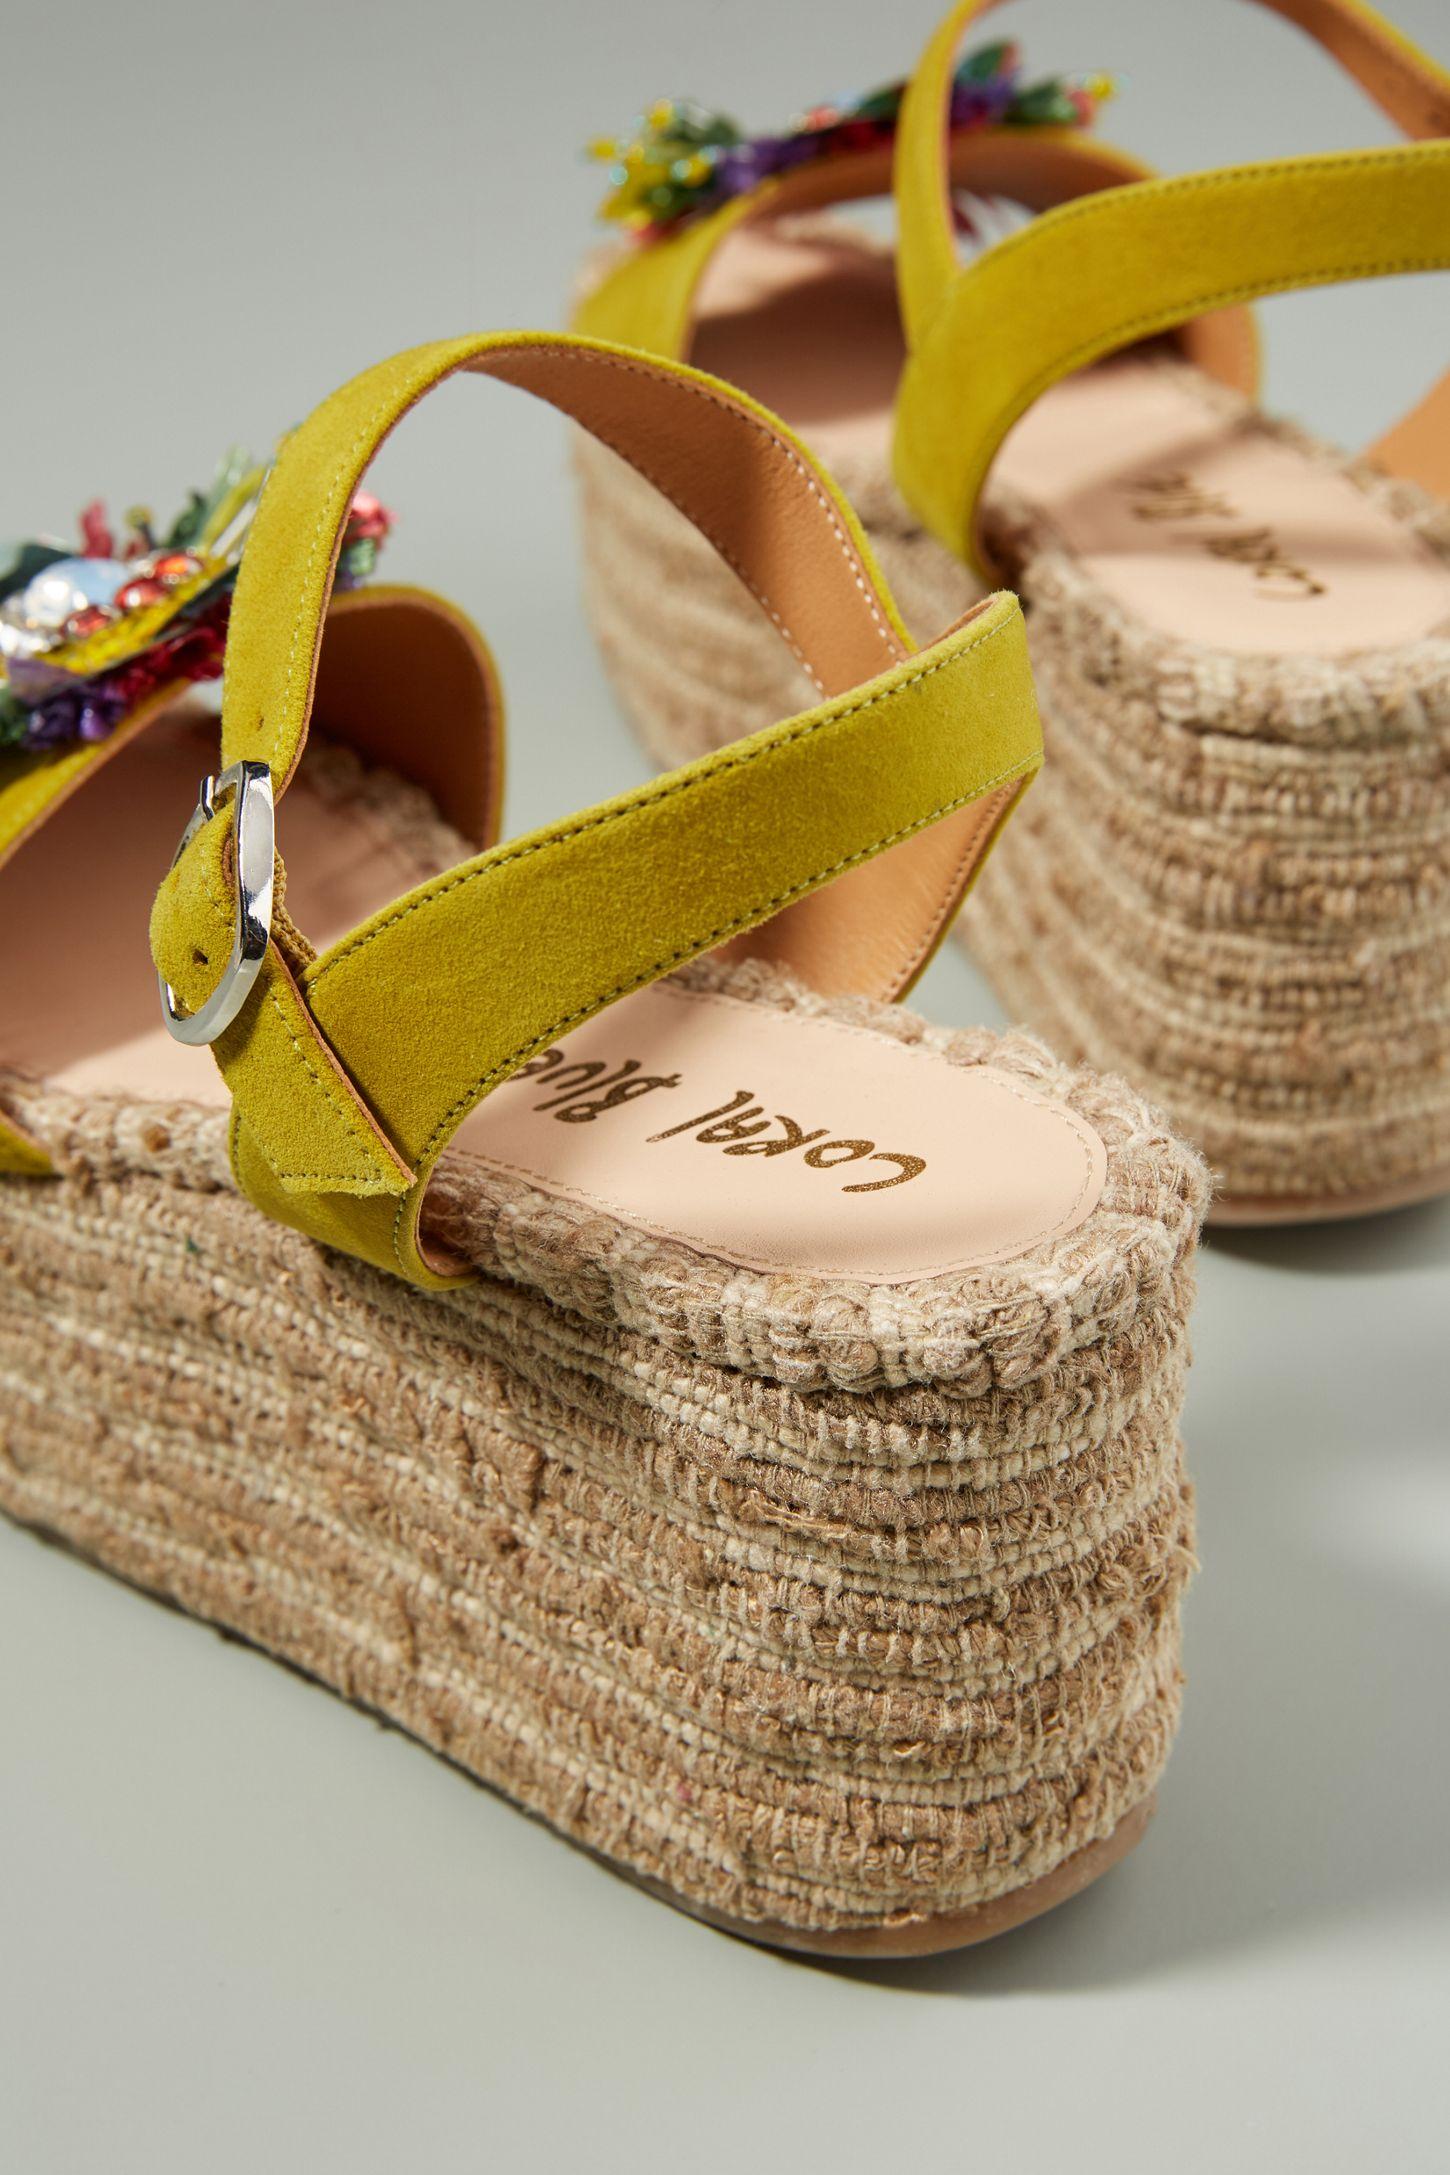 Coral Blue Embellished Platform Wedge Sandals shipping discount authentic explore cheap online 2014 sale online 7zDNs4DGk